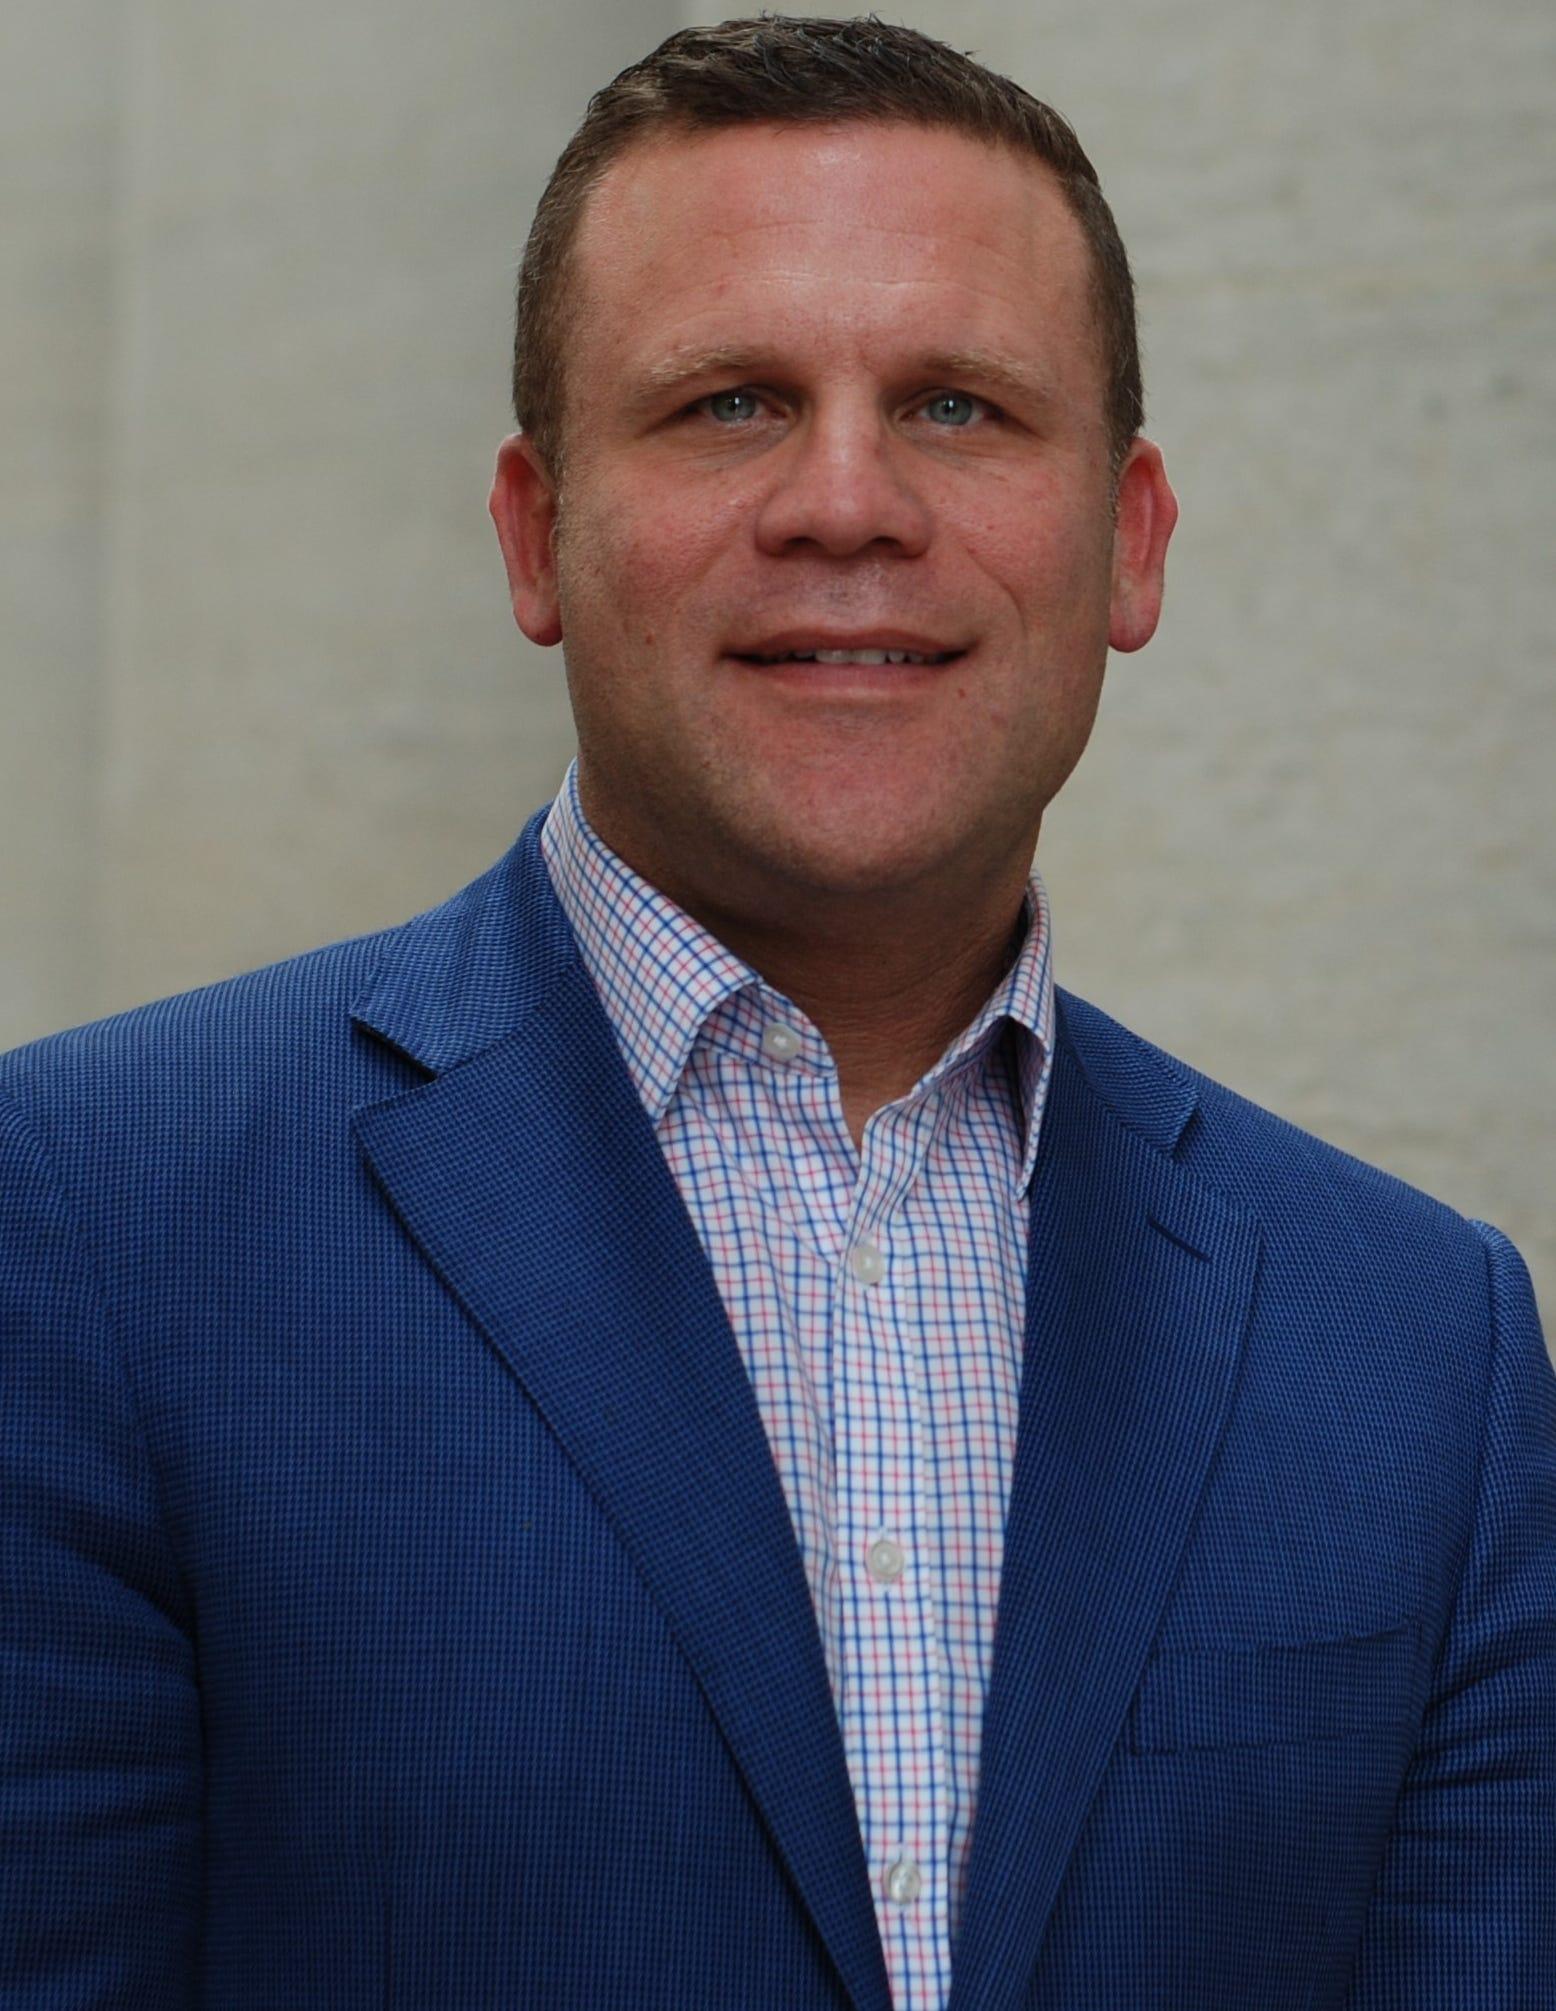 Michael Gonidakis, president of Ohio Right to Life